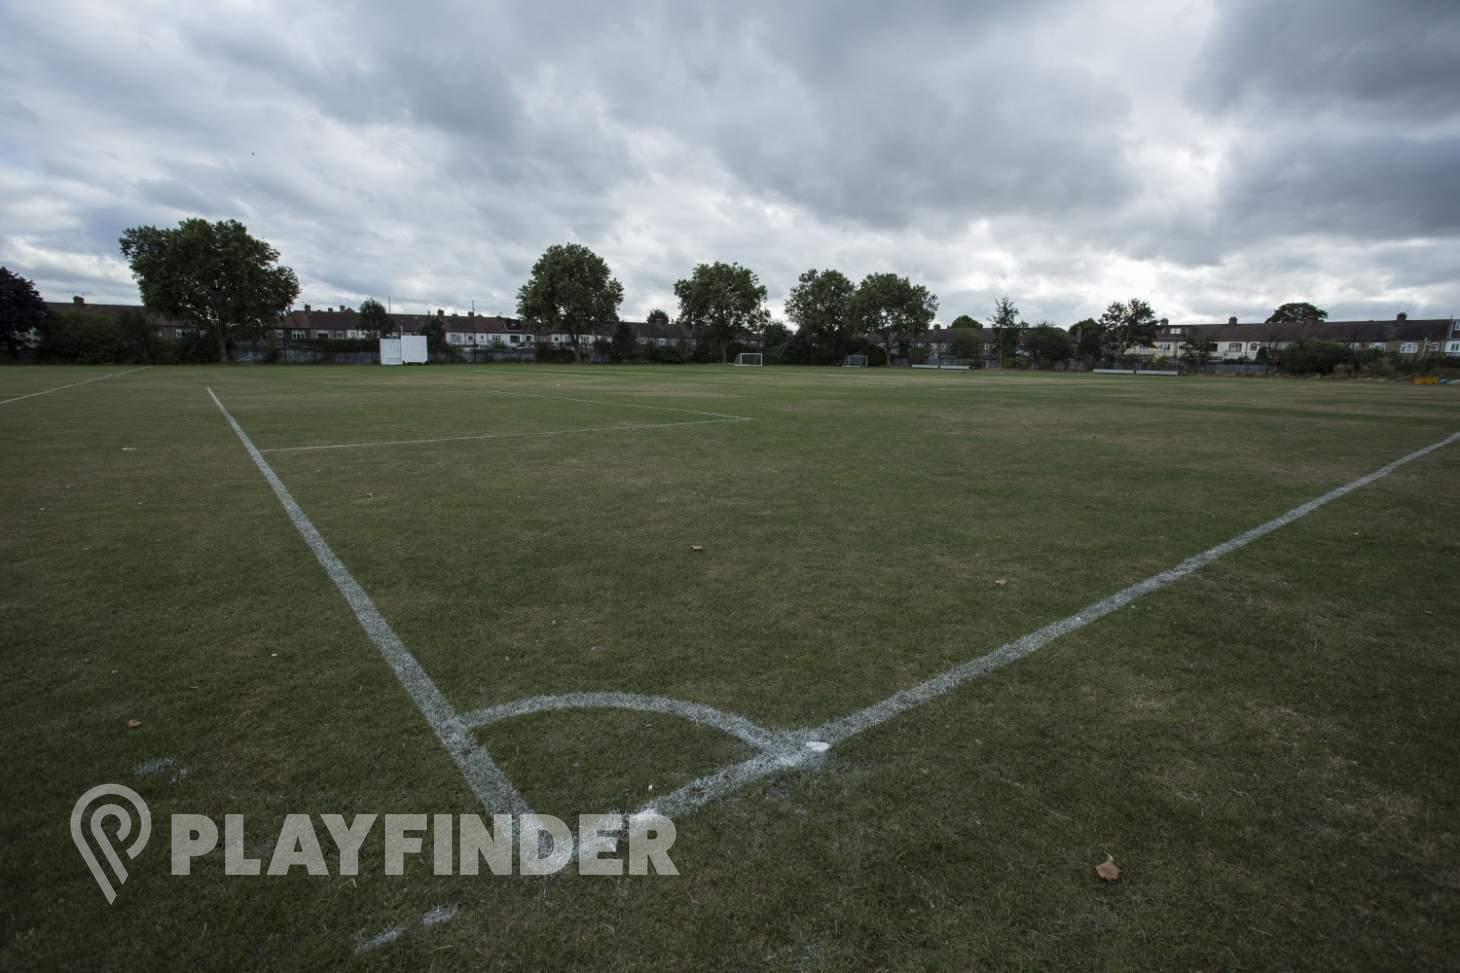 Flanders Playing Field